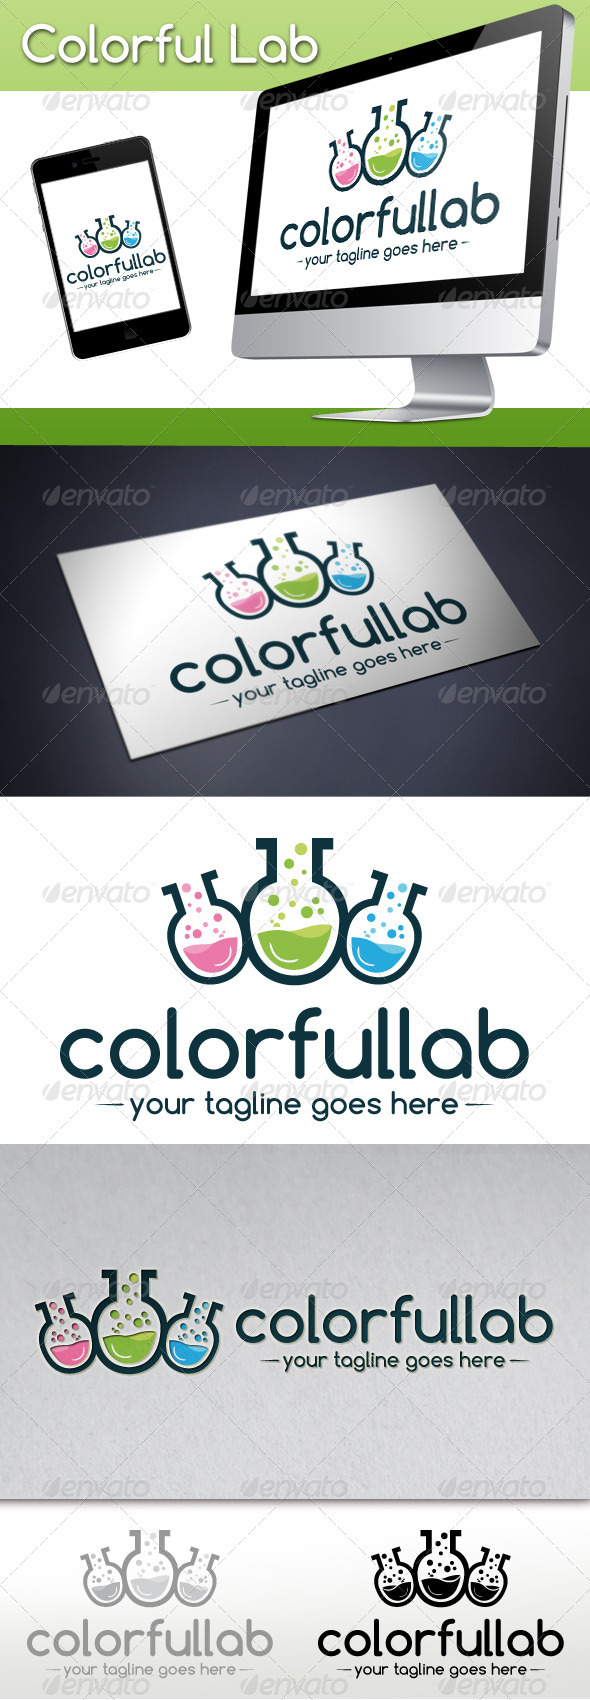 GraphicRiver Colorful Lab Logo Template 3765513